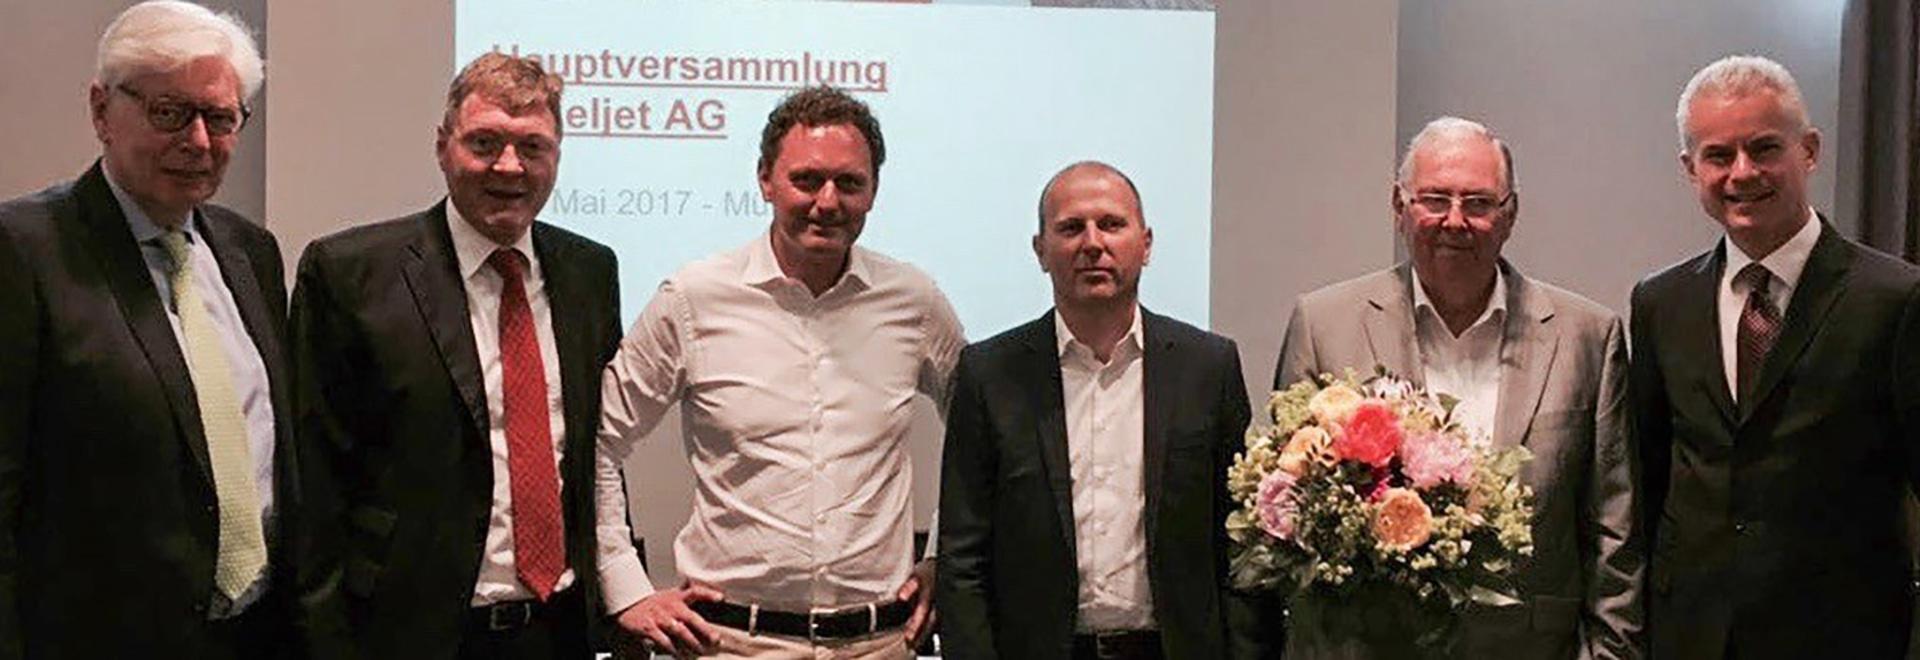 FLTR. El Dr. Stefan Söhn (presidente) de Debuty, Peter Nietzer (presidente), Rudolf Franz (COO/CFO), el Dr. Ingo Ederer (CEO), profesor el Dr. el Dr. Joachim Heinzl, und Eberhard Weiblen